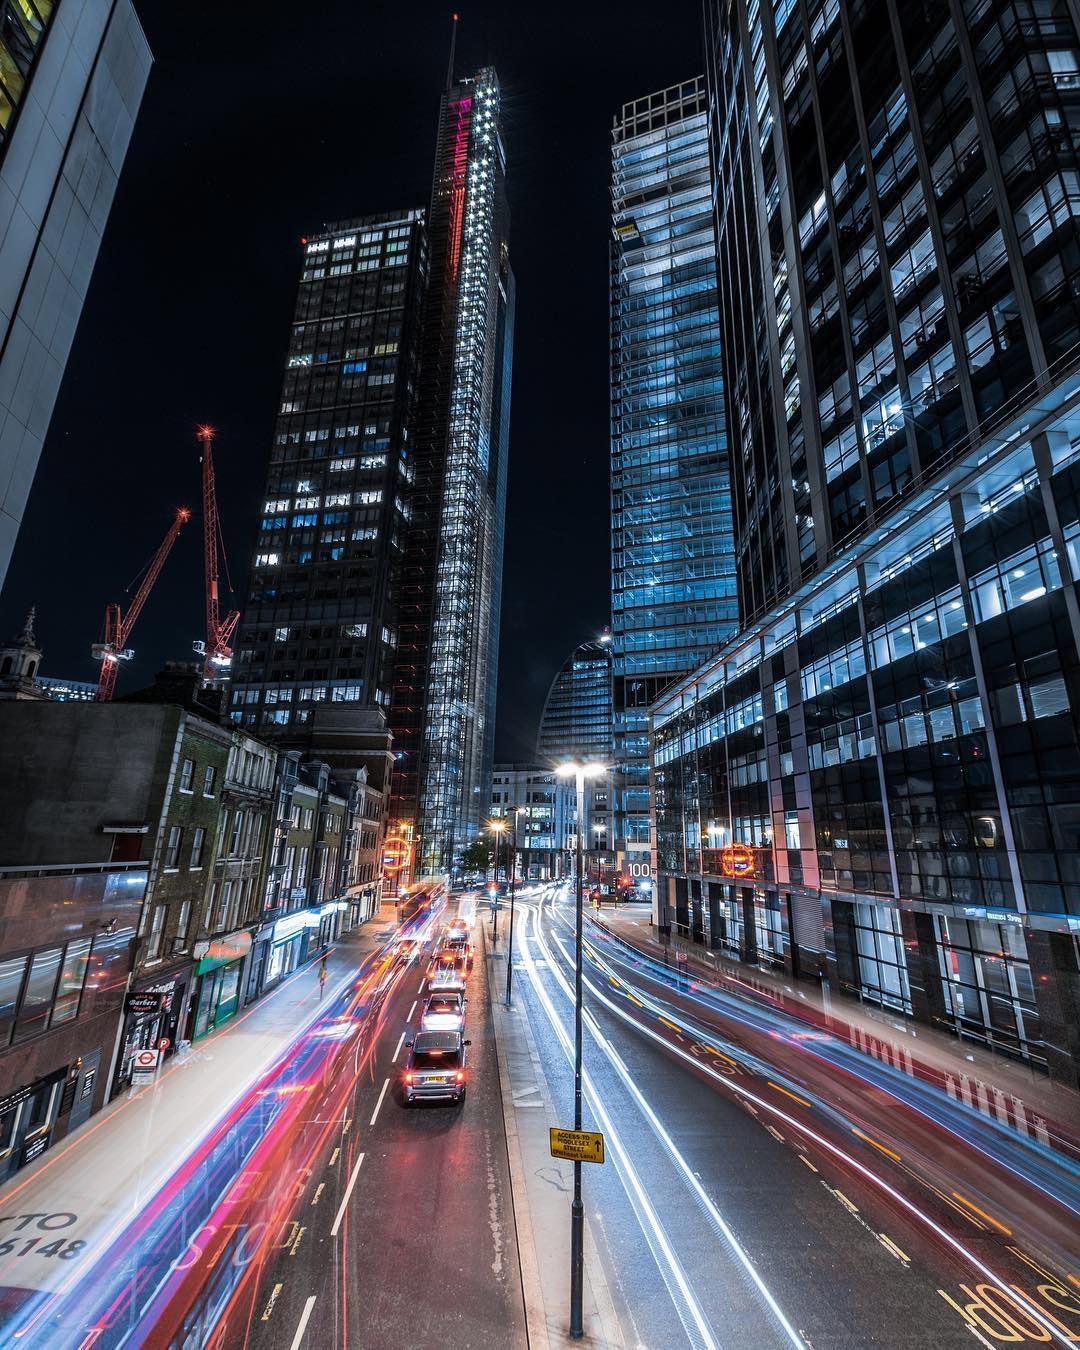 ночной Лондон фотографии Люк Холбрук Luke Holbrook